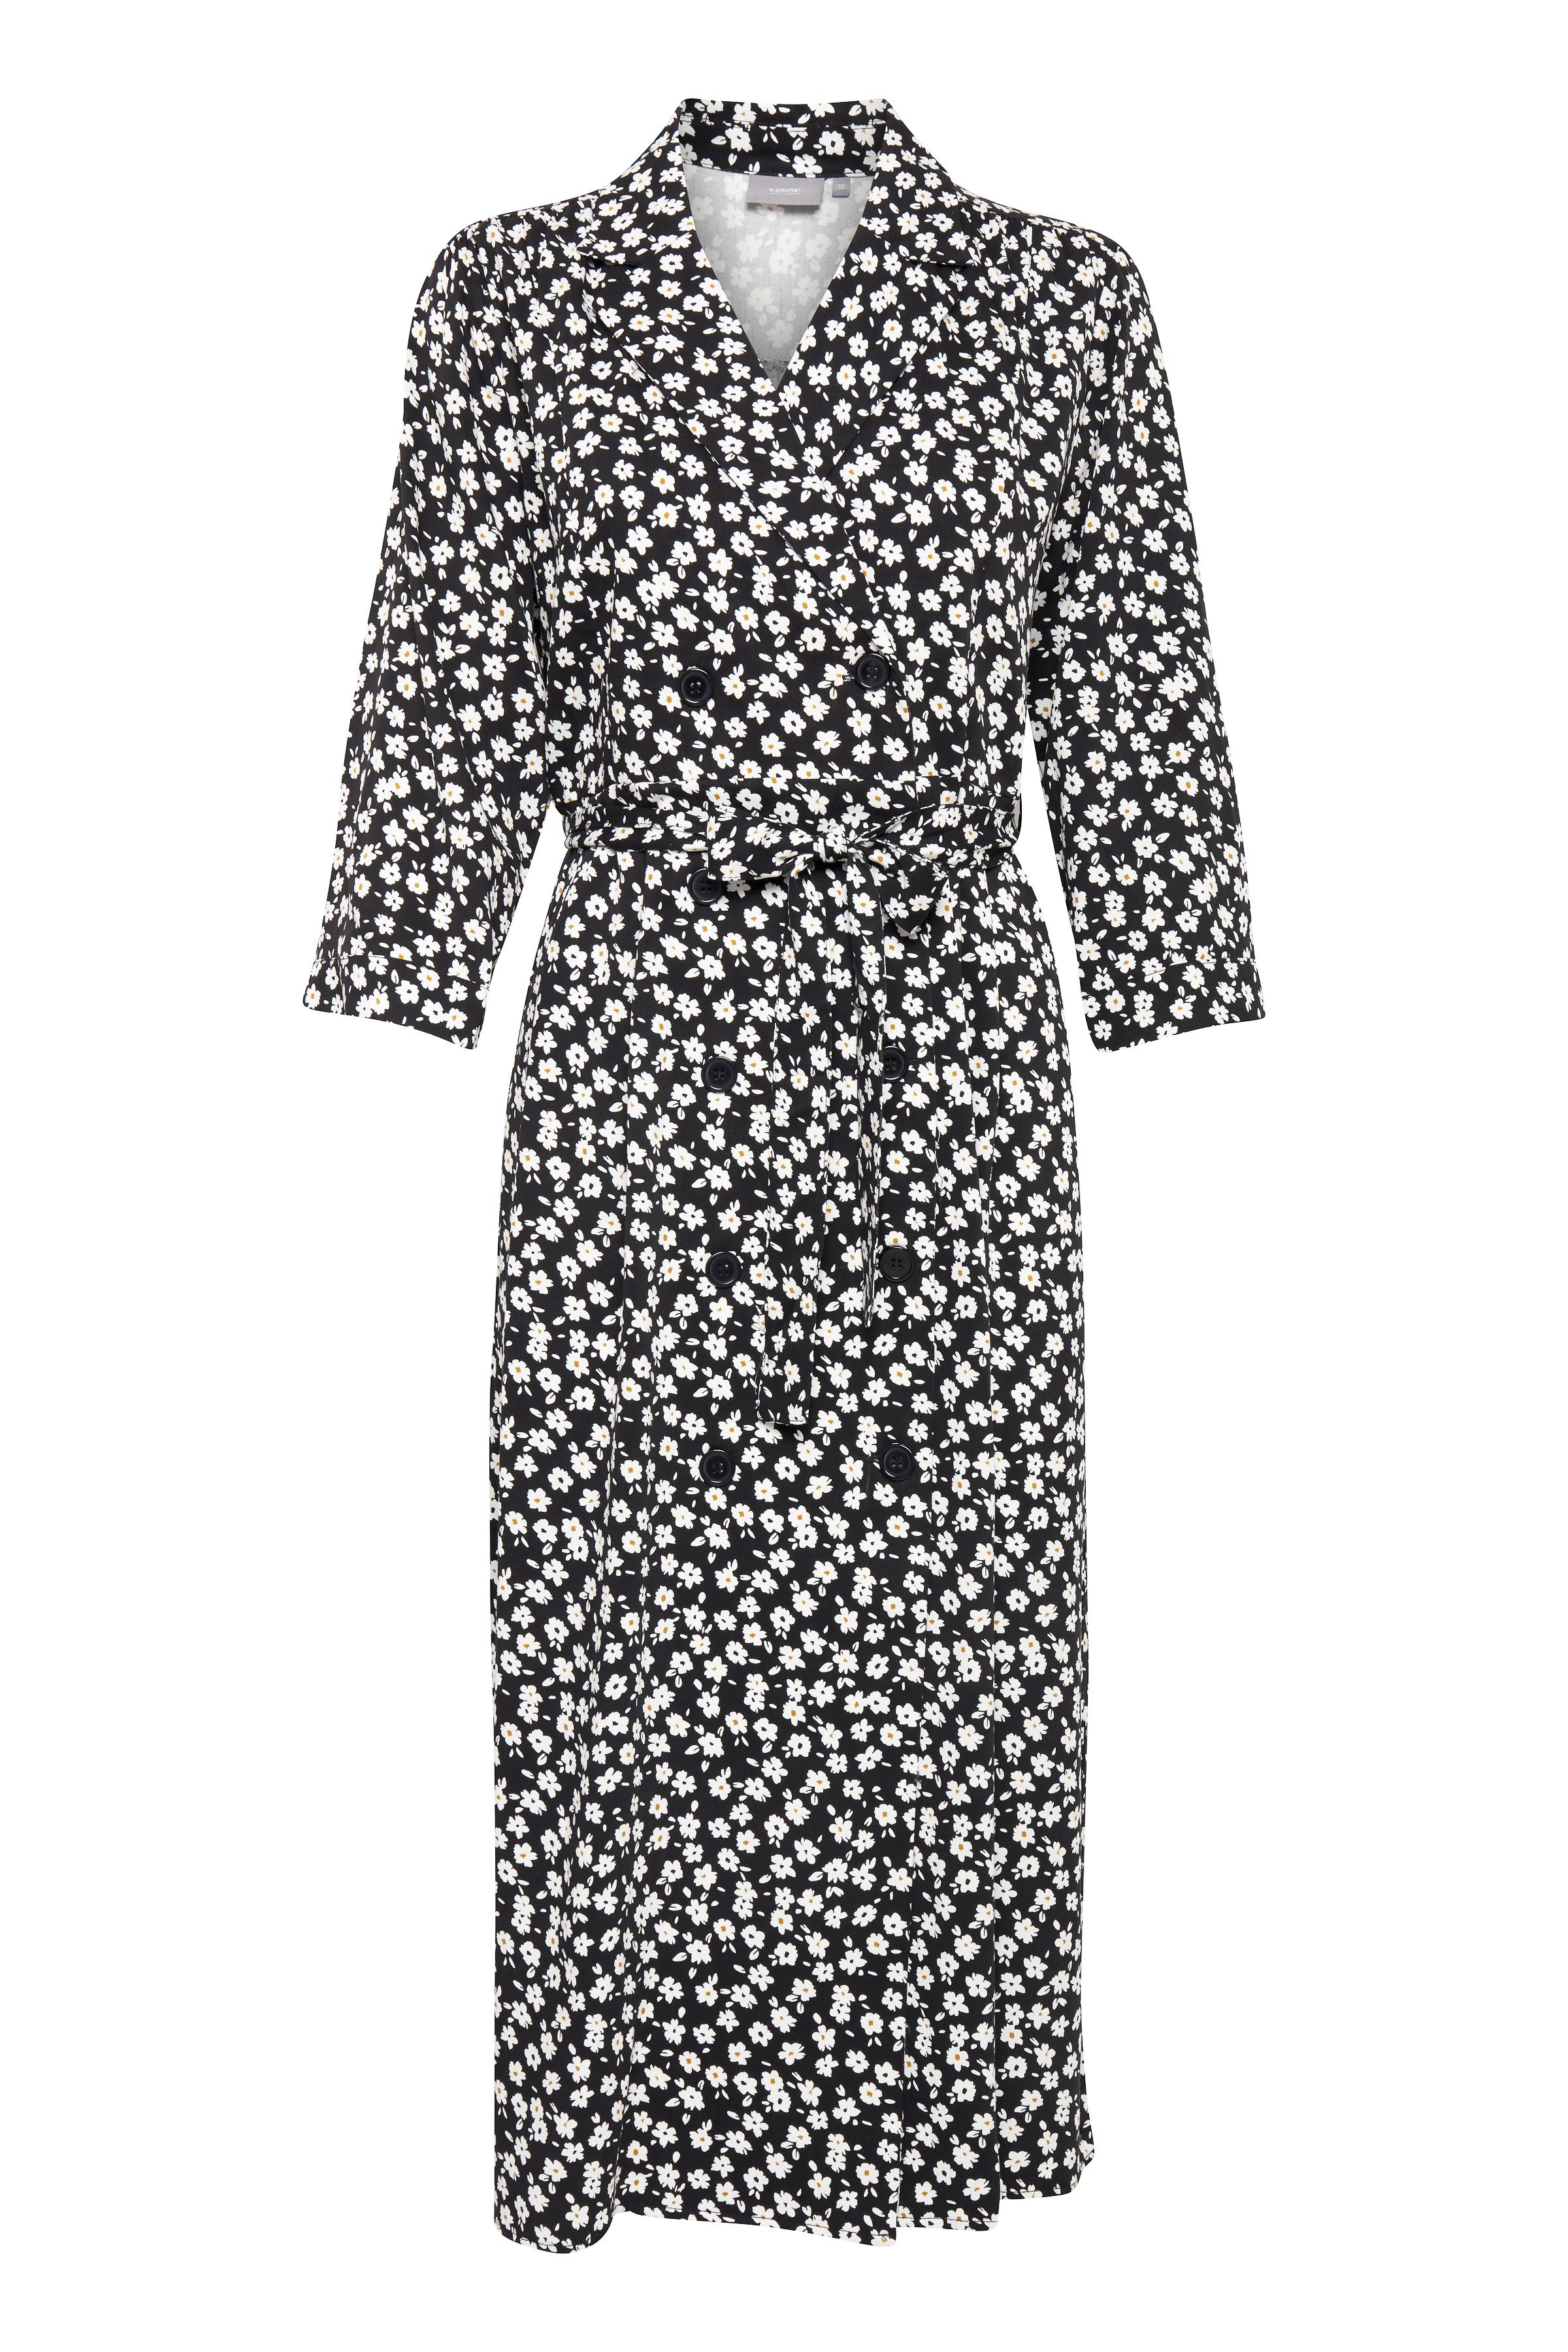 b.young Dame Dobbeltradet kjole - Sort/hvid